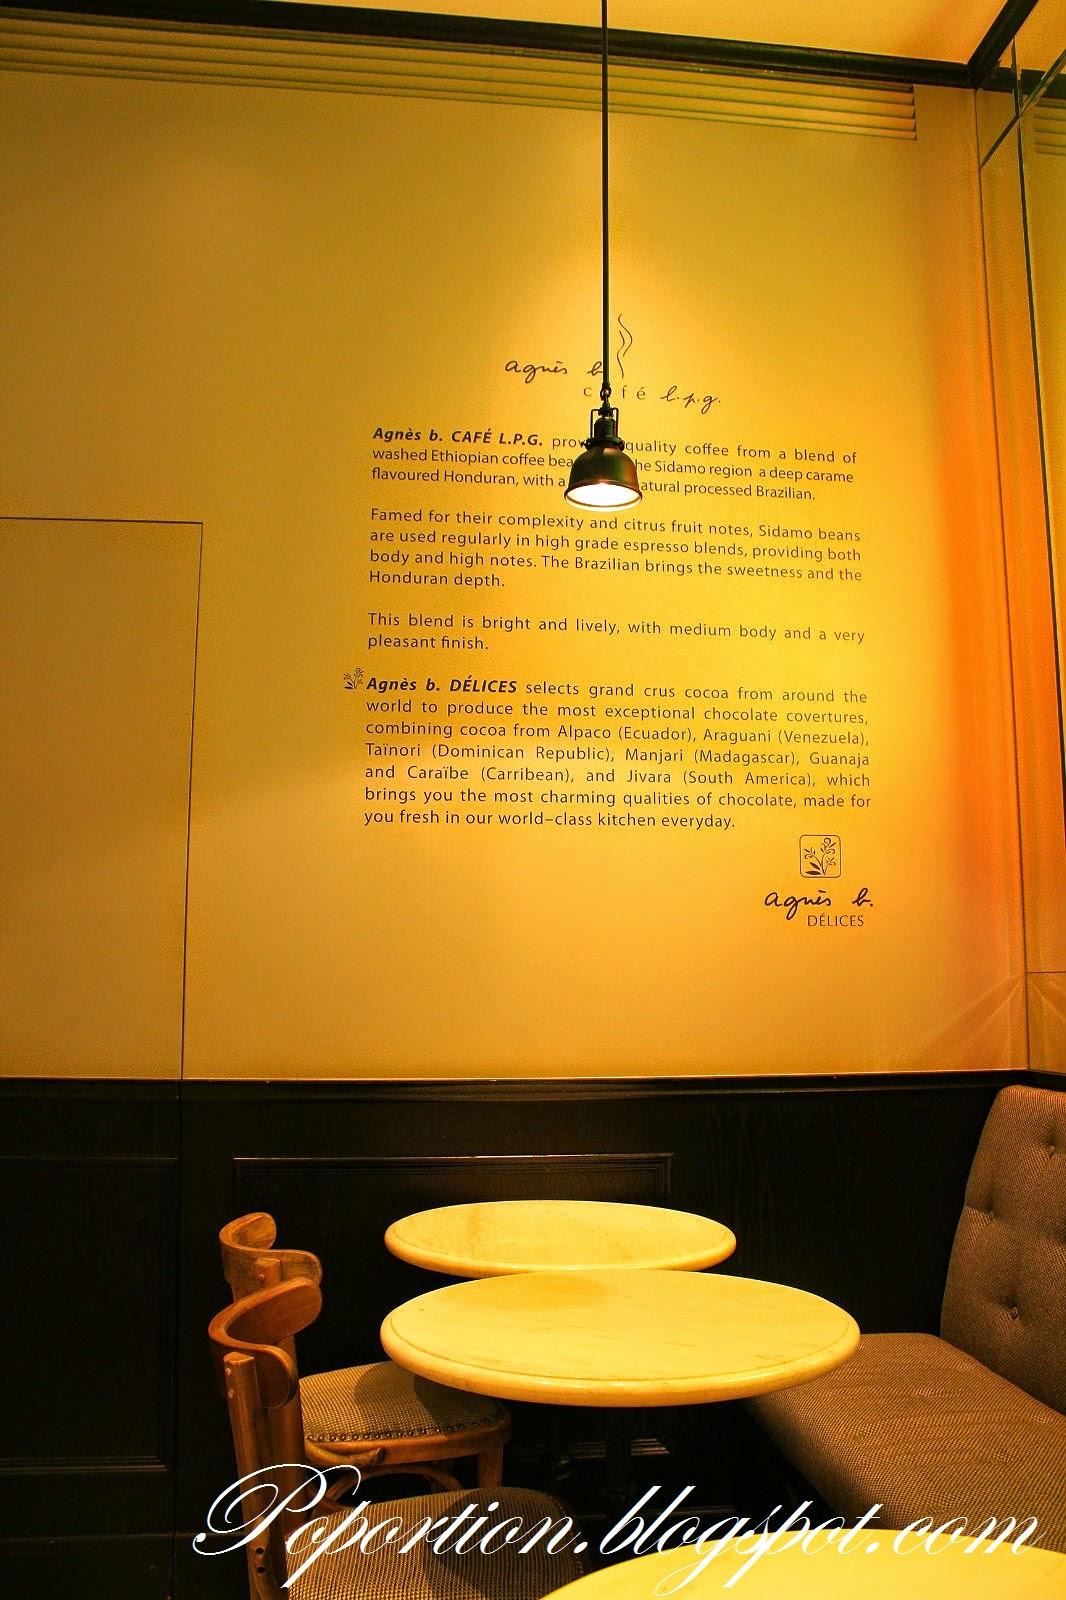 taipei 101 agnes b cafe